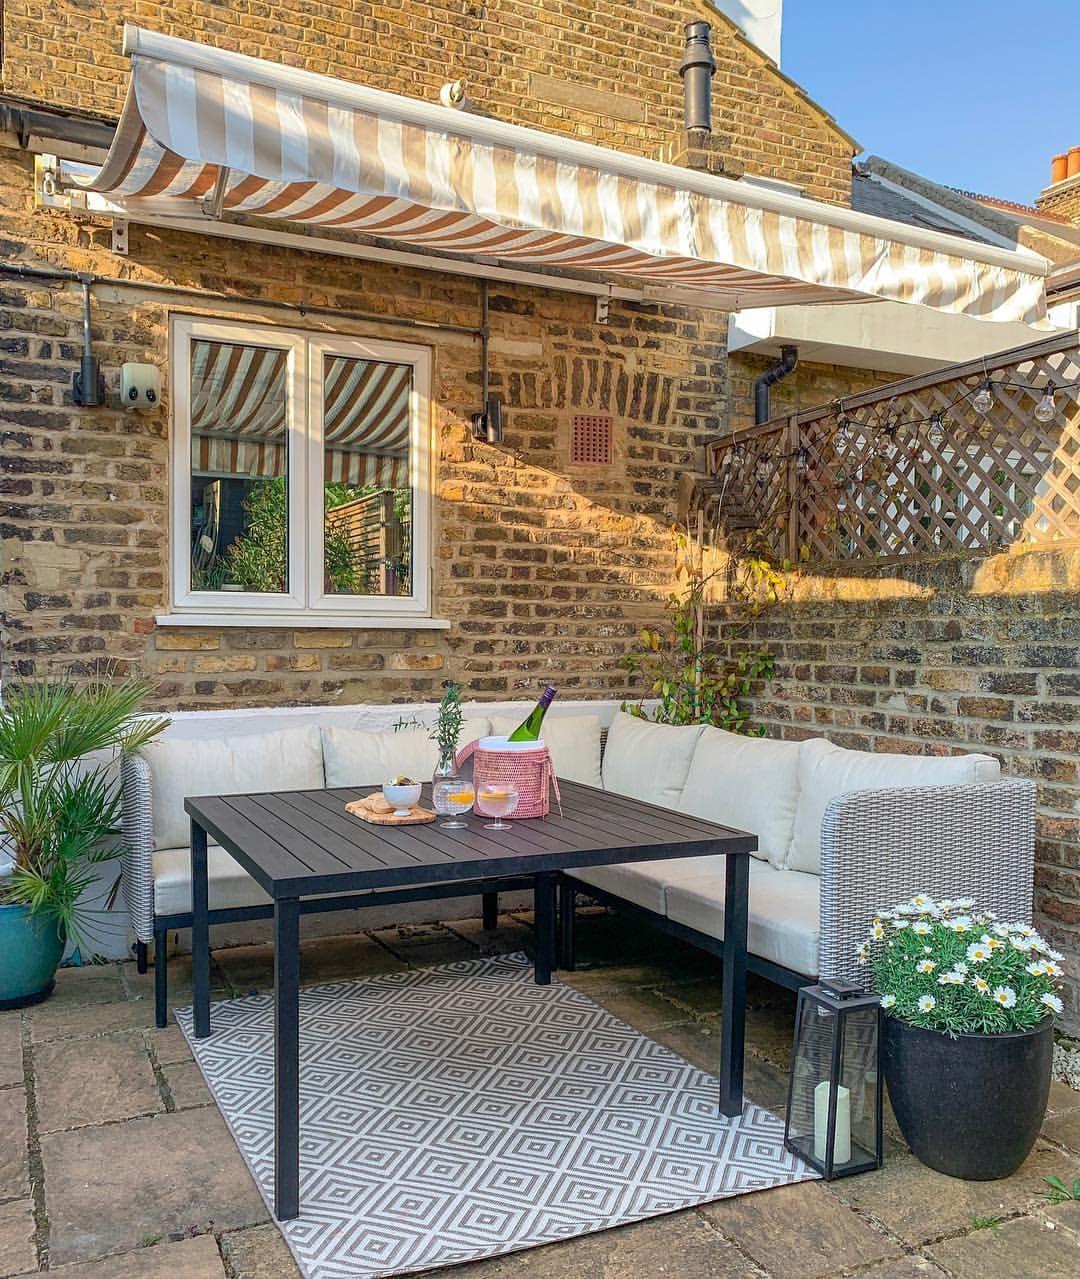 Outdoor garden and patio space. Garden furniture, awning